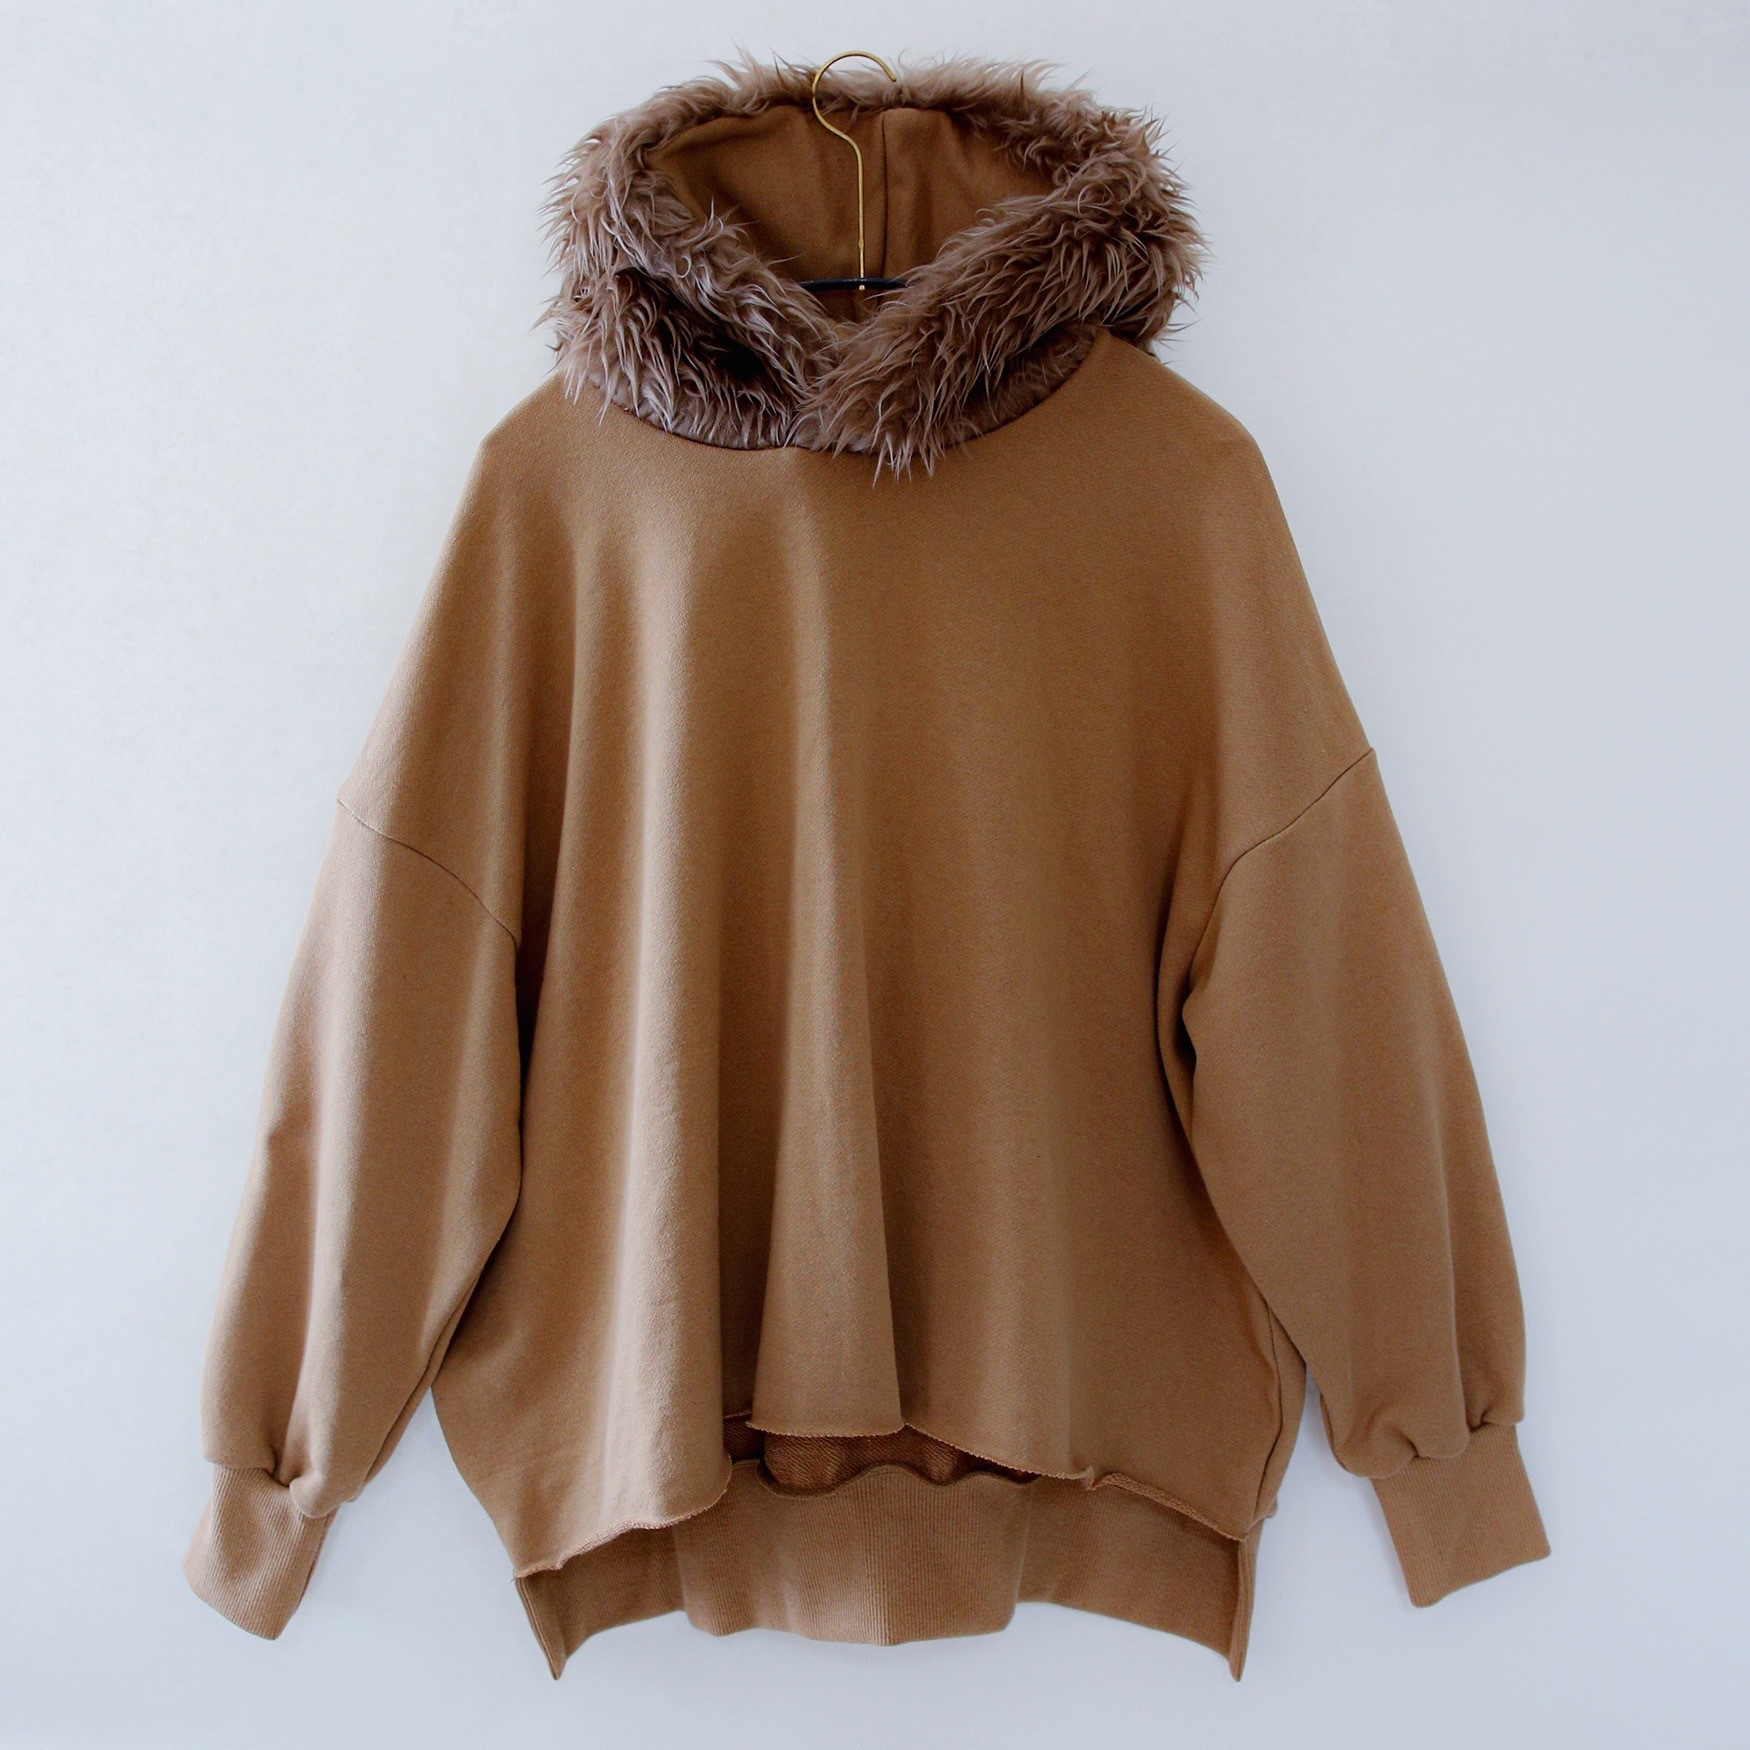 《michirico 2020AW》Fur hoodie / cinnamon / F(大人)